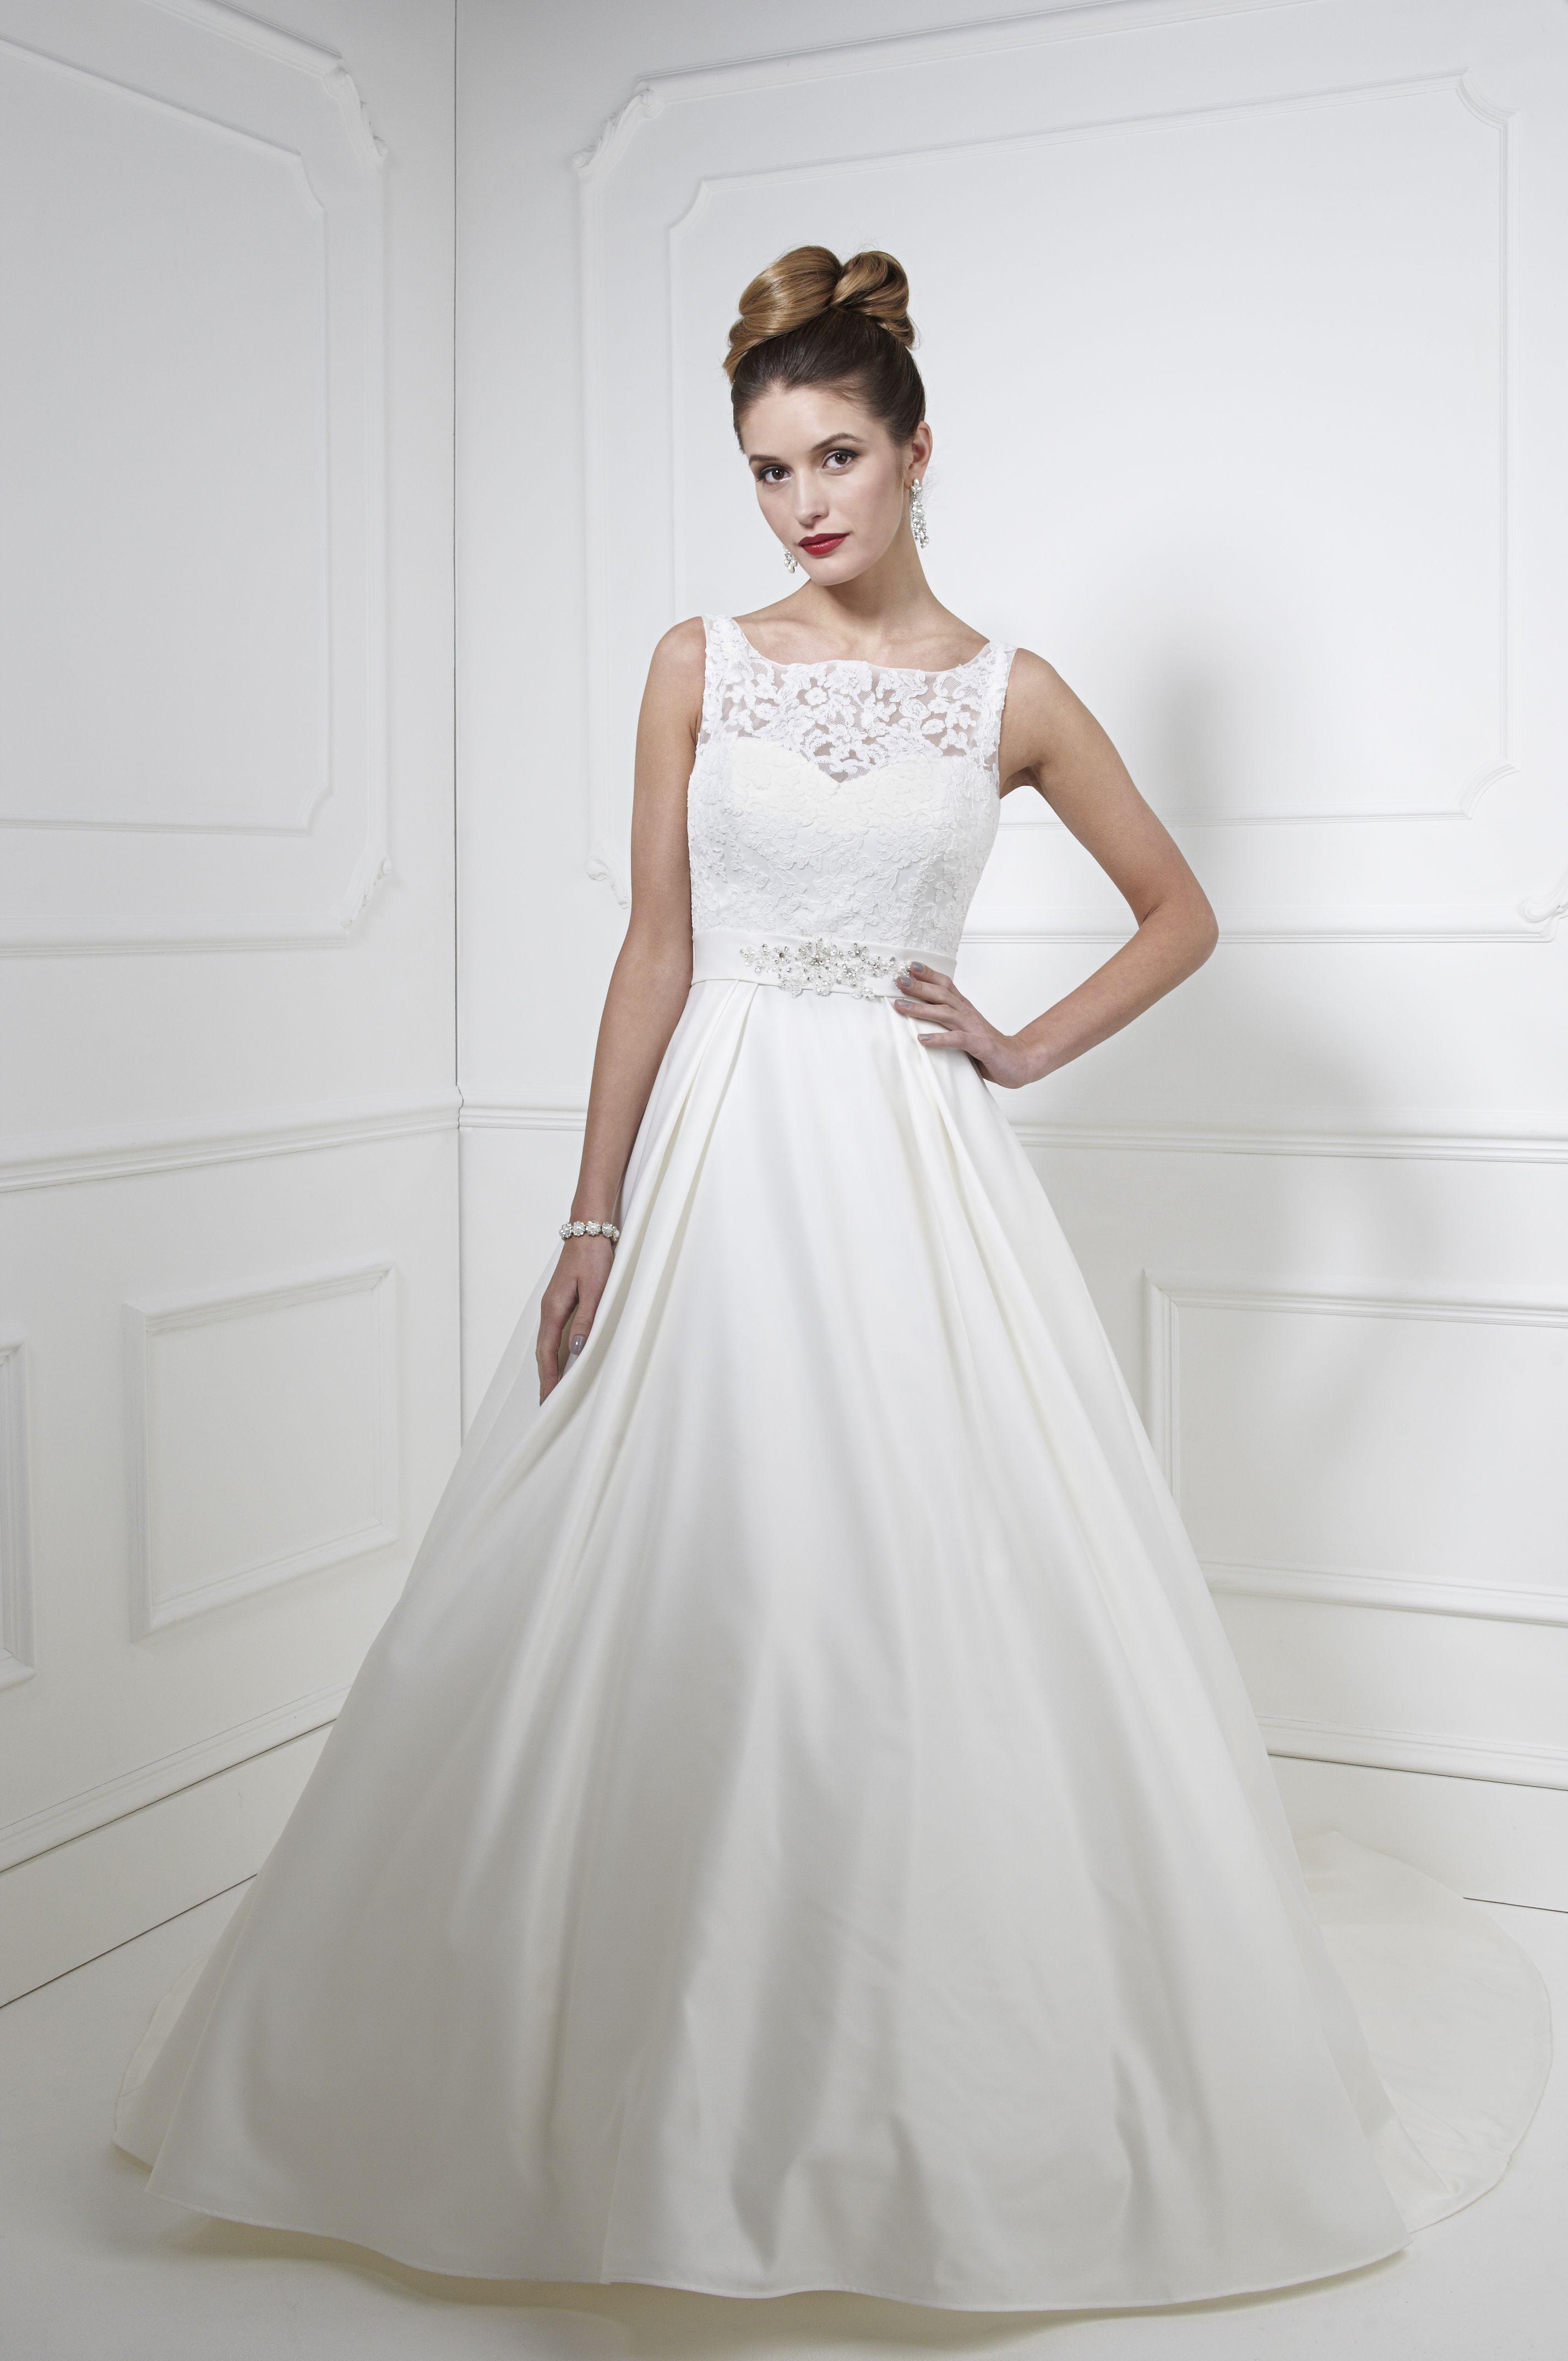 Kelsey Rose #weddingdress | Katie Robinson | Pinterest | Rose ...